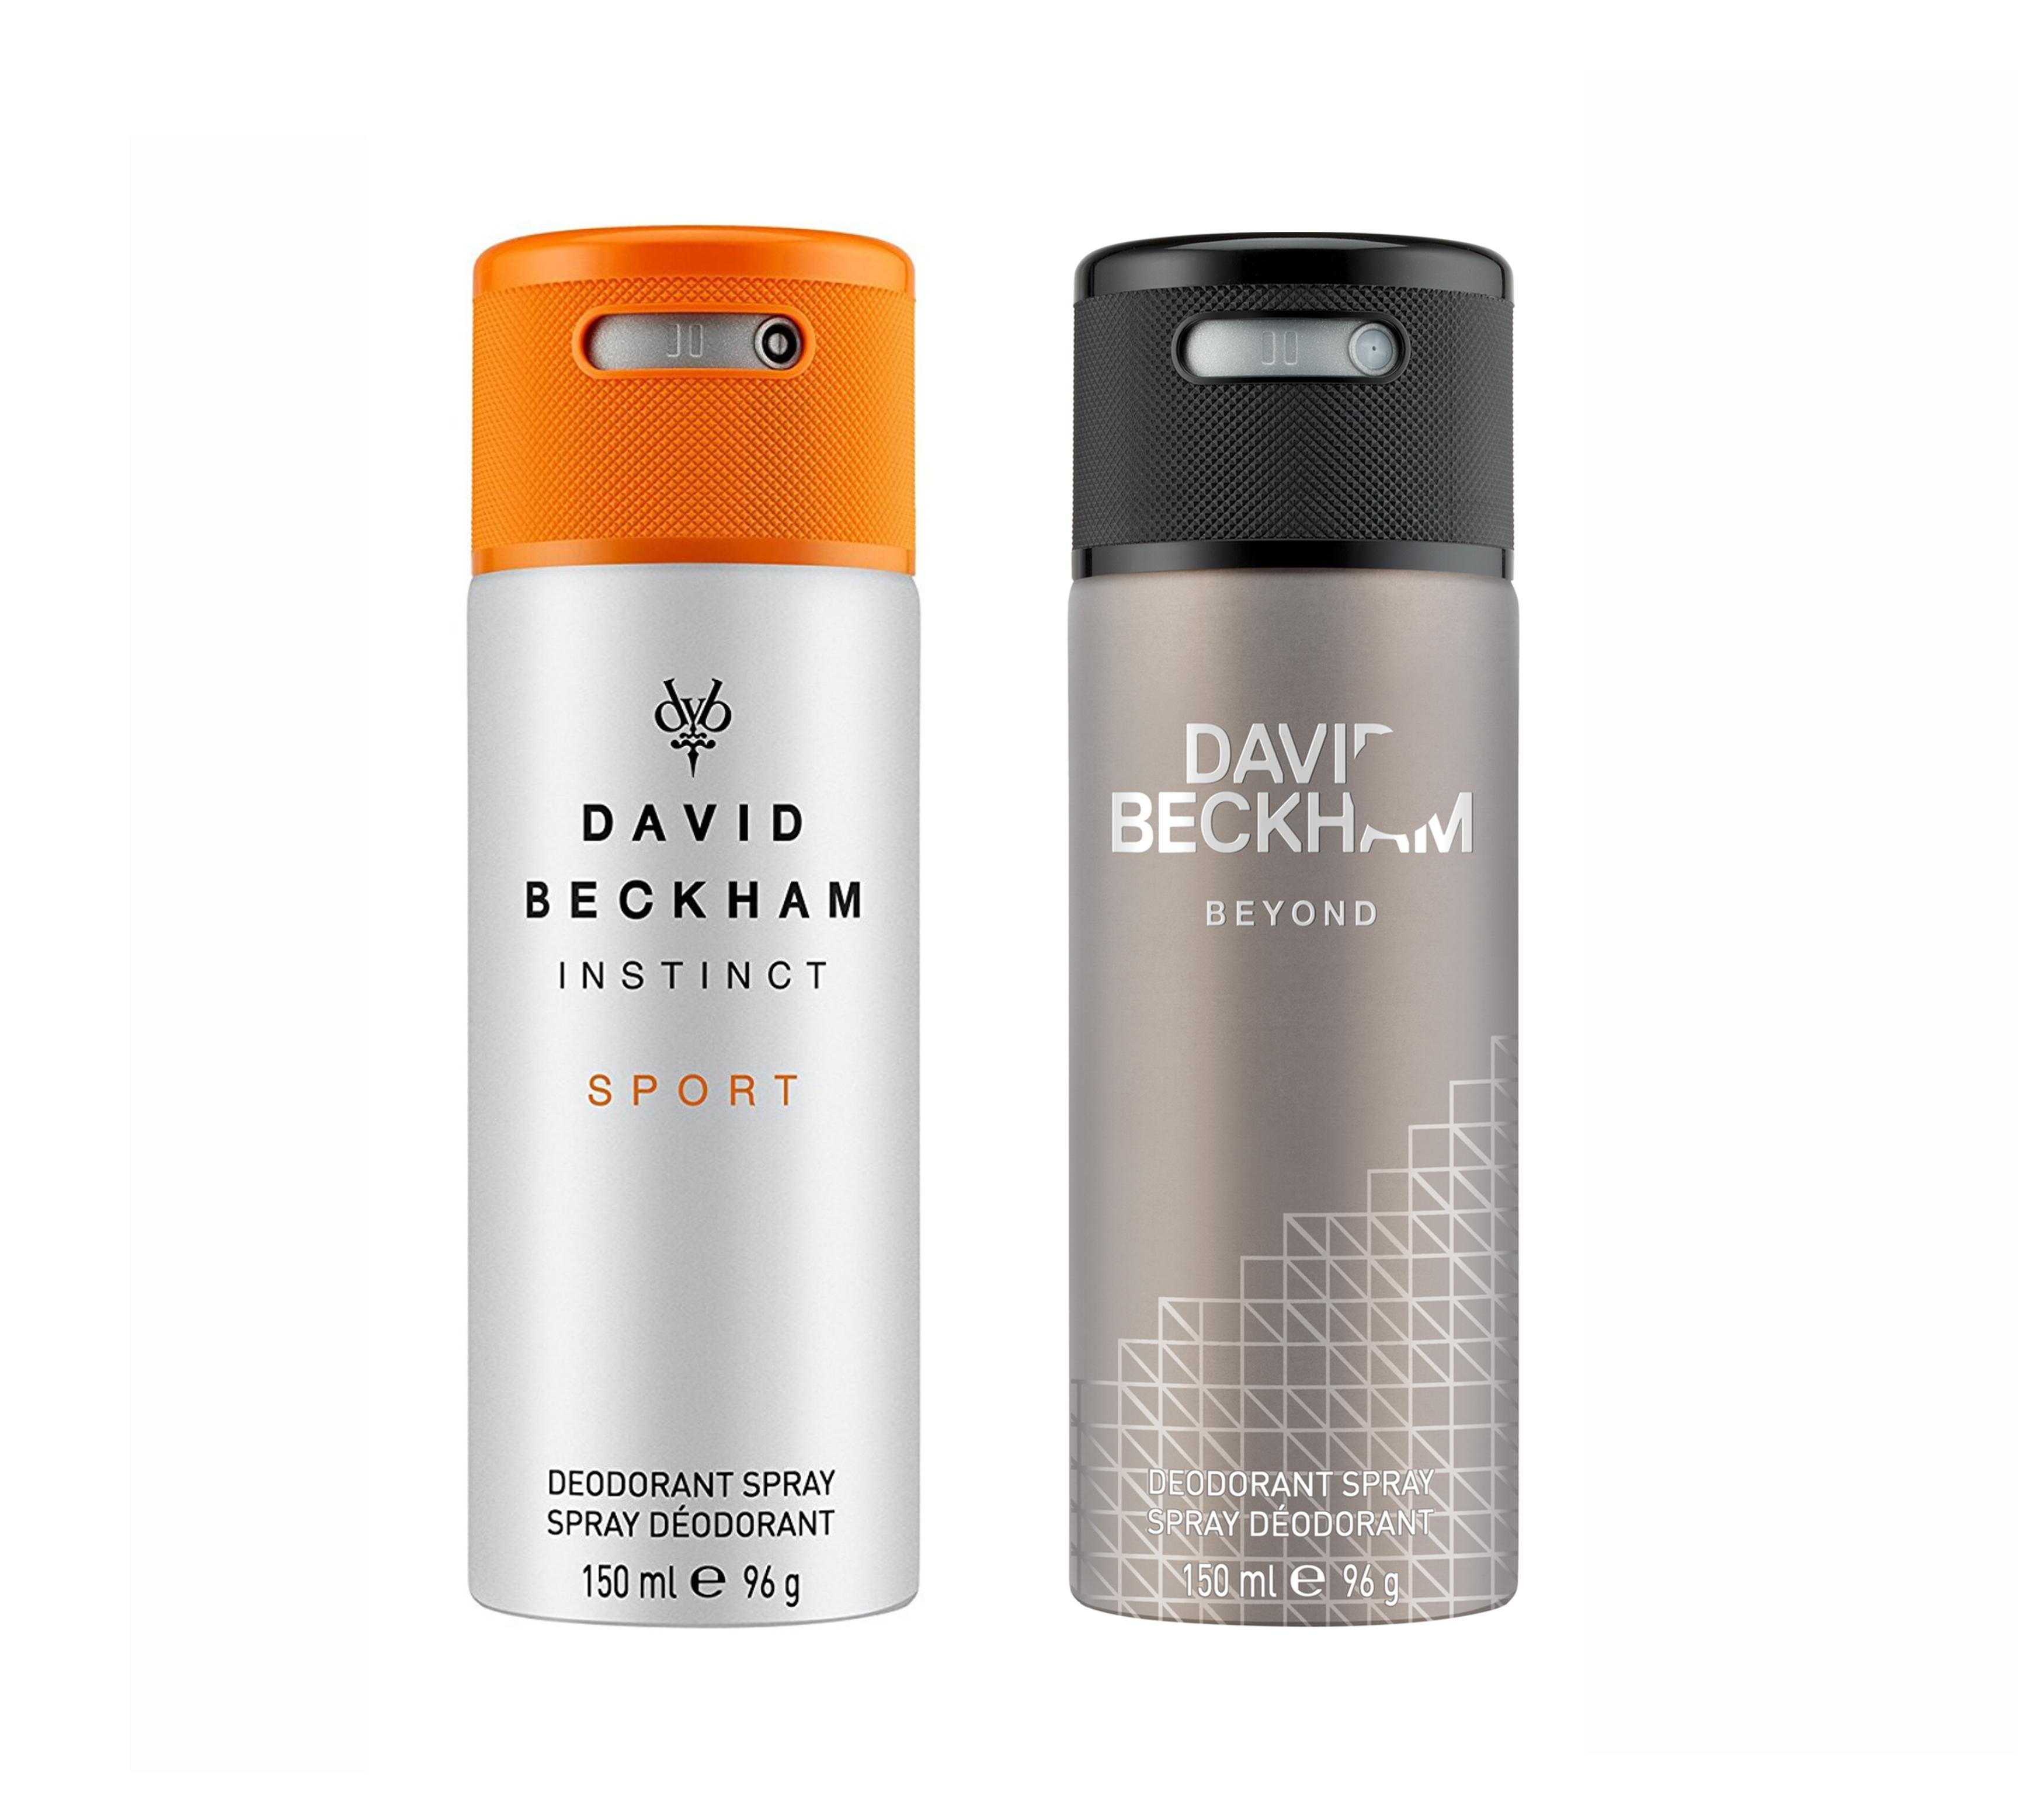 David Beckham | Instinct Sport and Beyond Deo Combo Set of 2